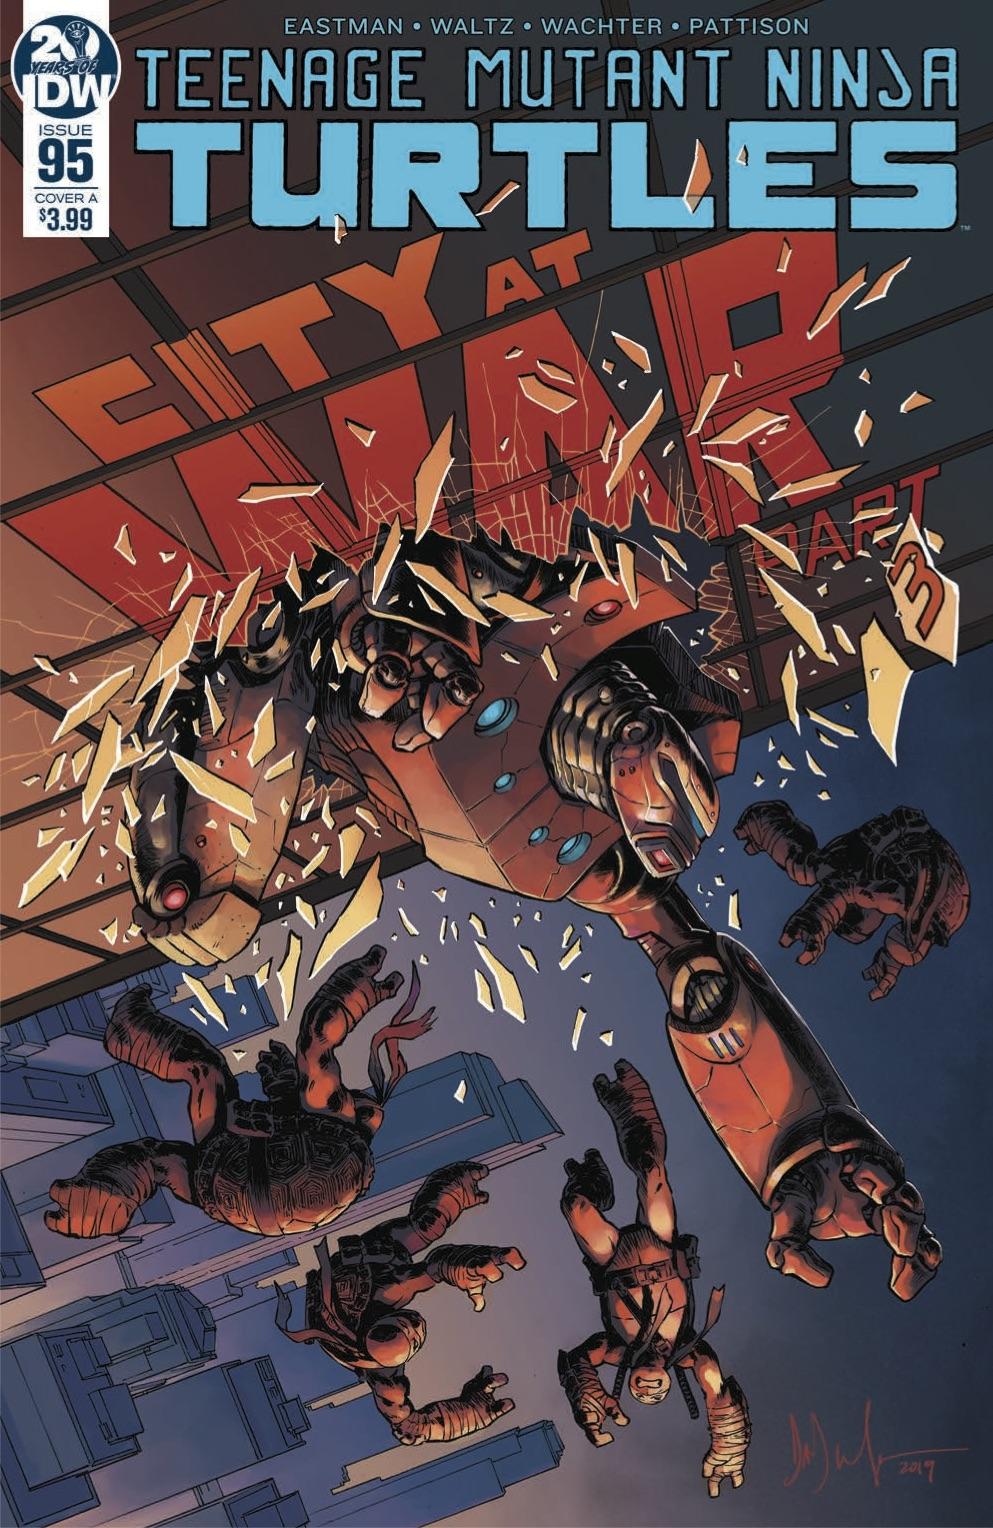 5 Reasons To Get 'Teenage Mutant Ninja Turtles' #95